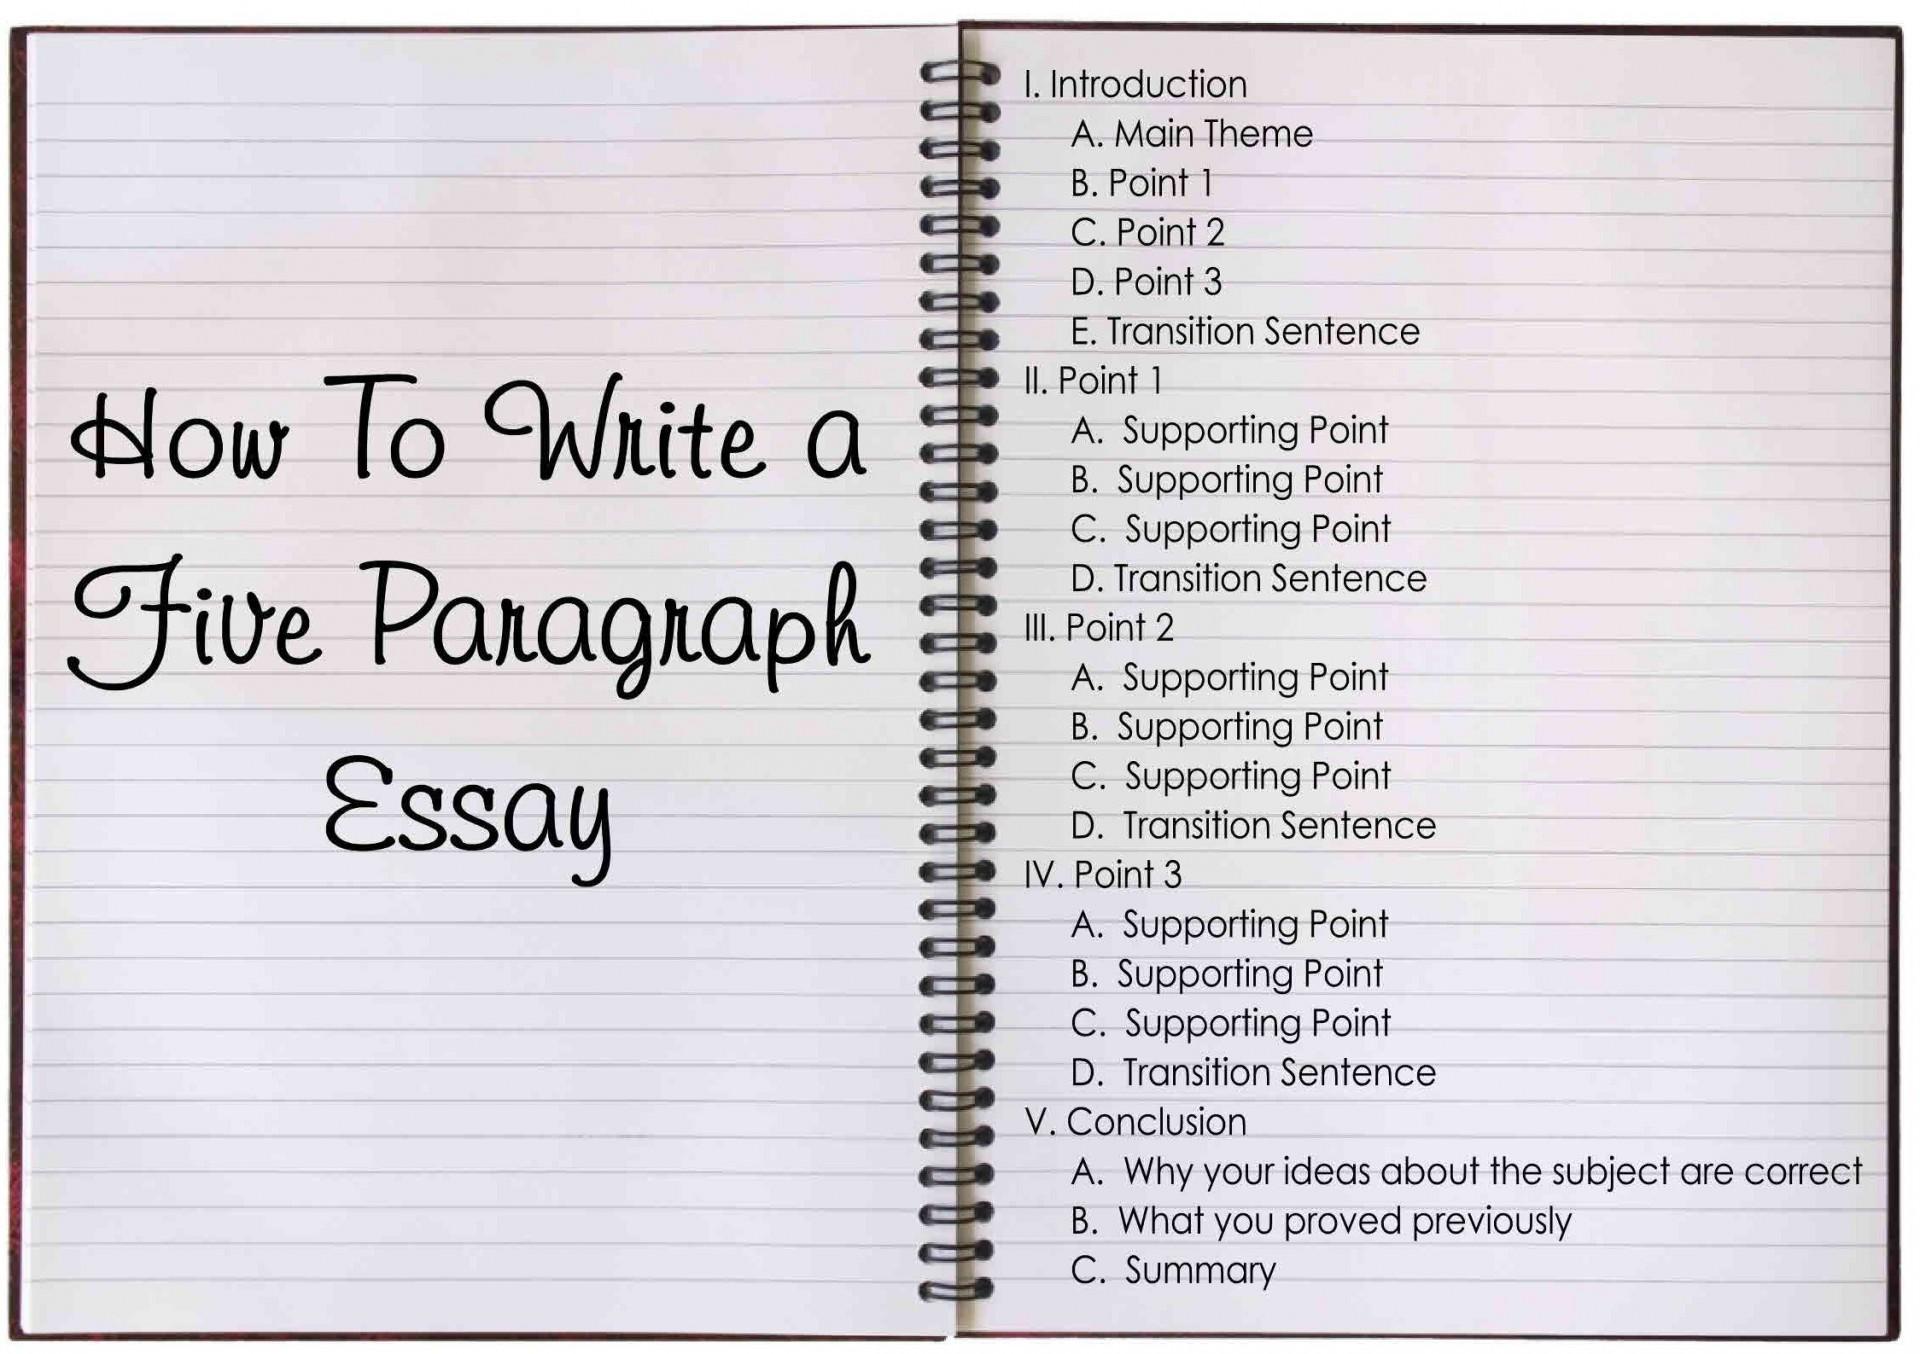 017 Essay Example Paragraph High Sensational 5 School Pdf Template For 1920